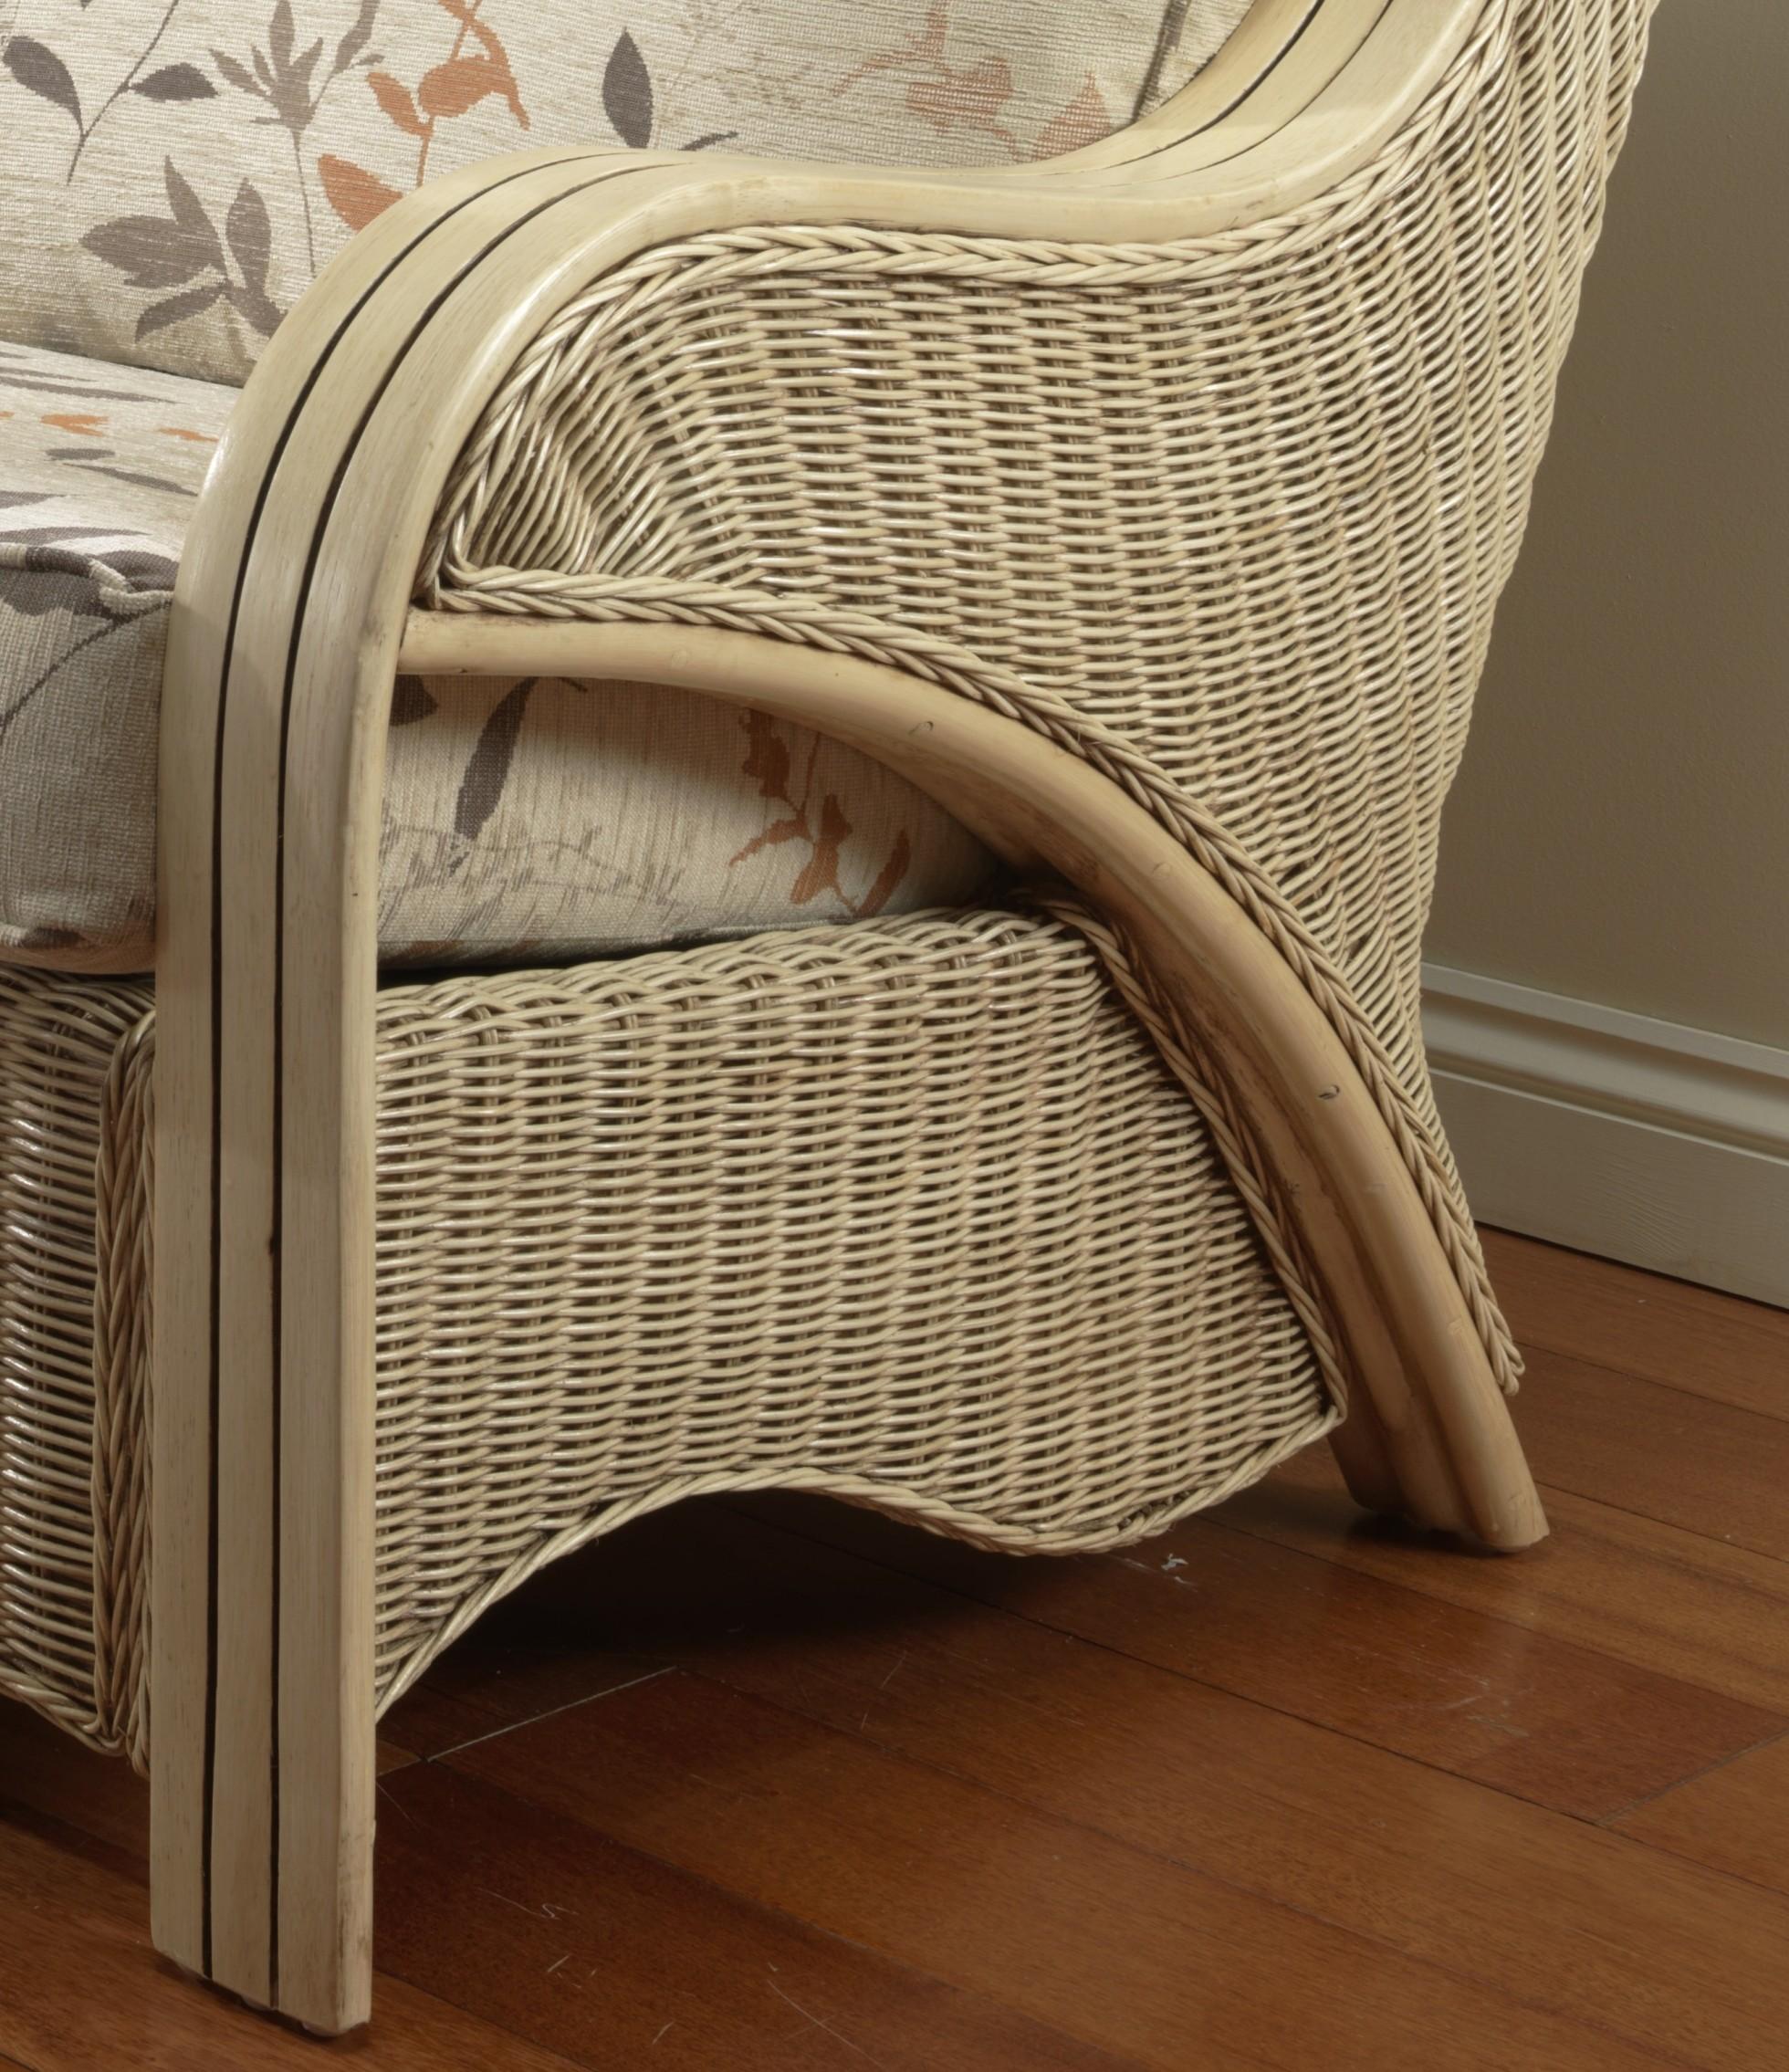 Desser 3 Seater Opera Sofa sold at Highgate Furniture Southend On sea Essex